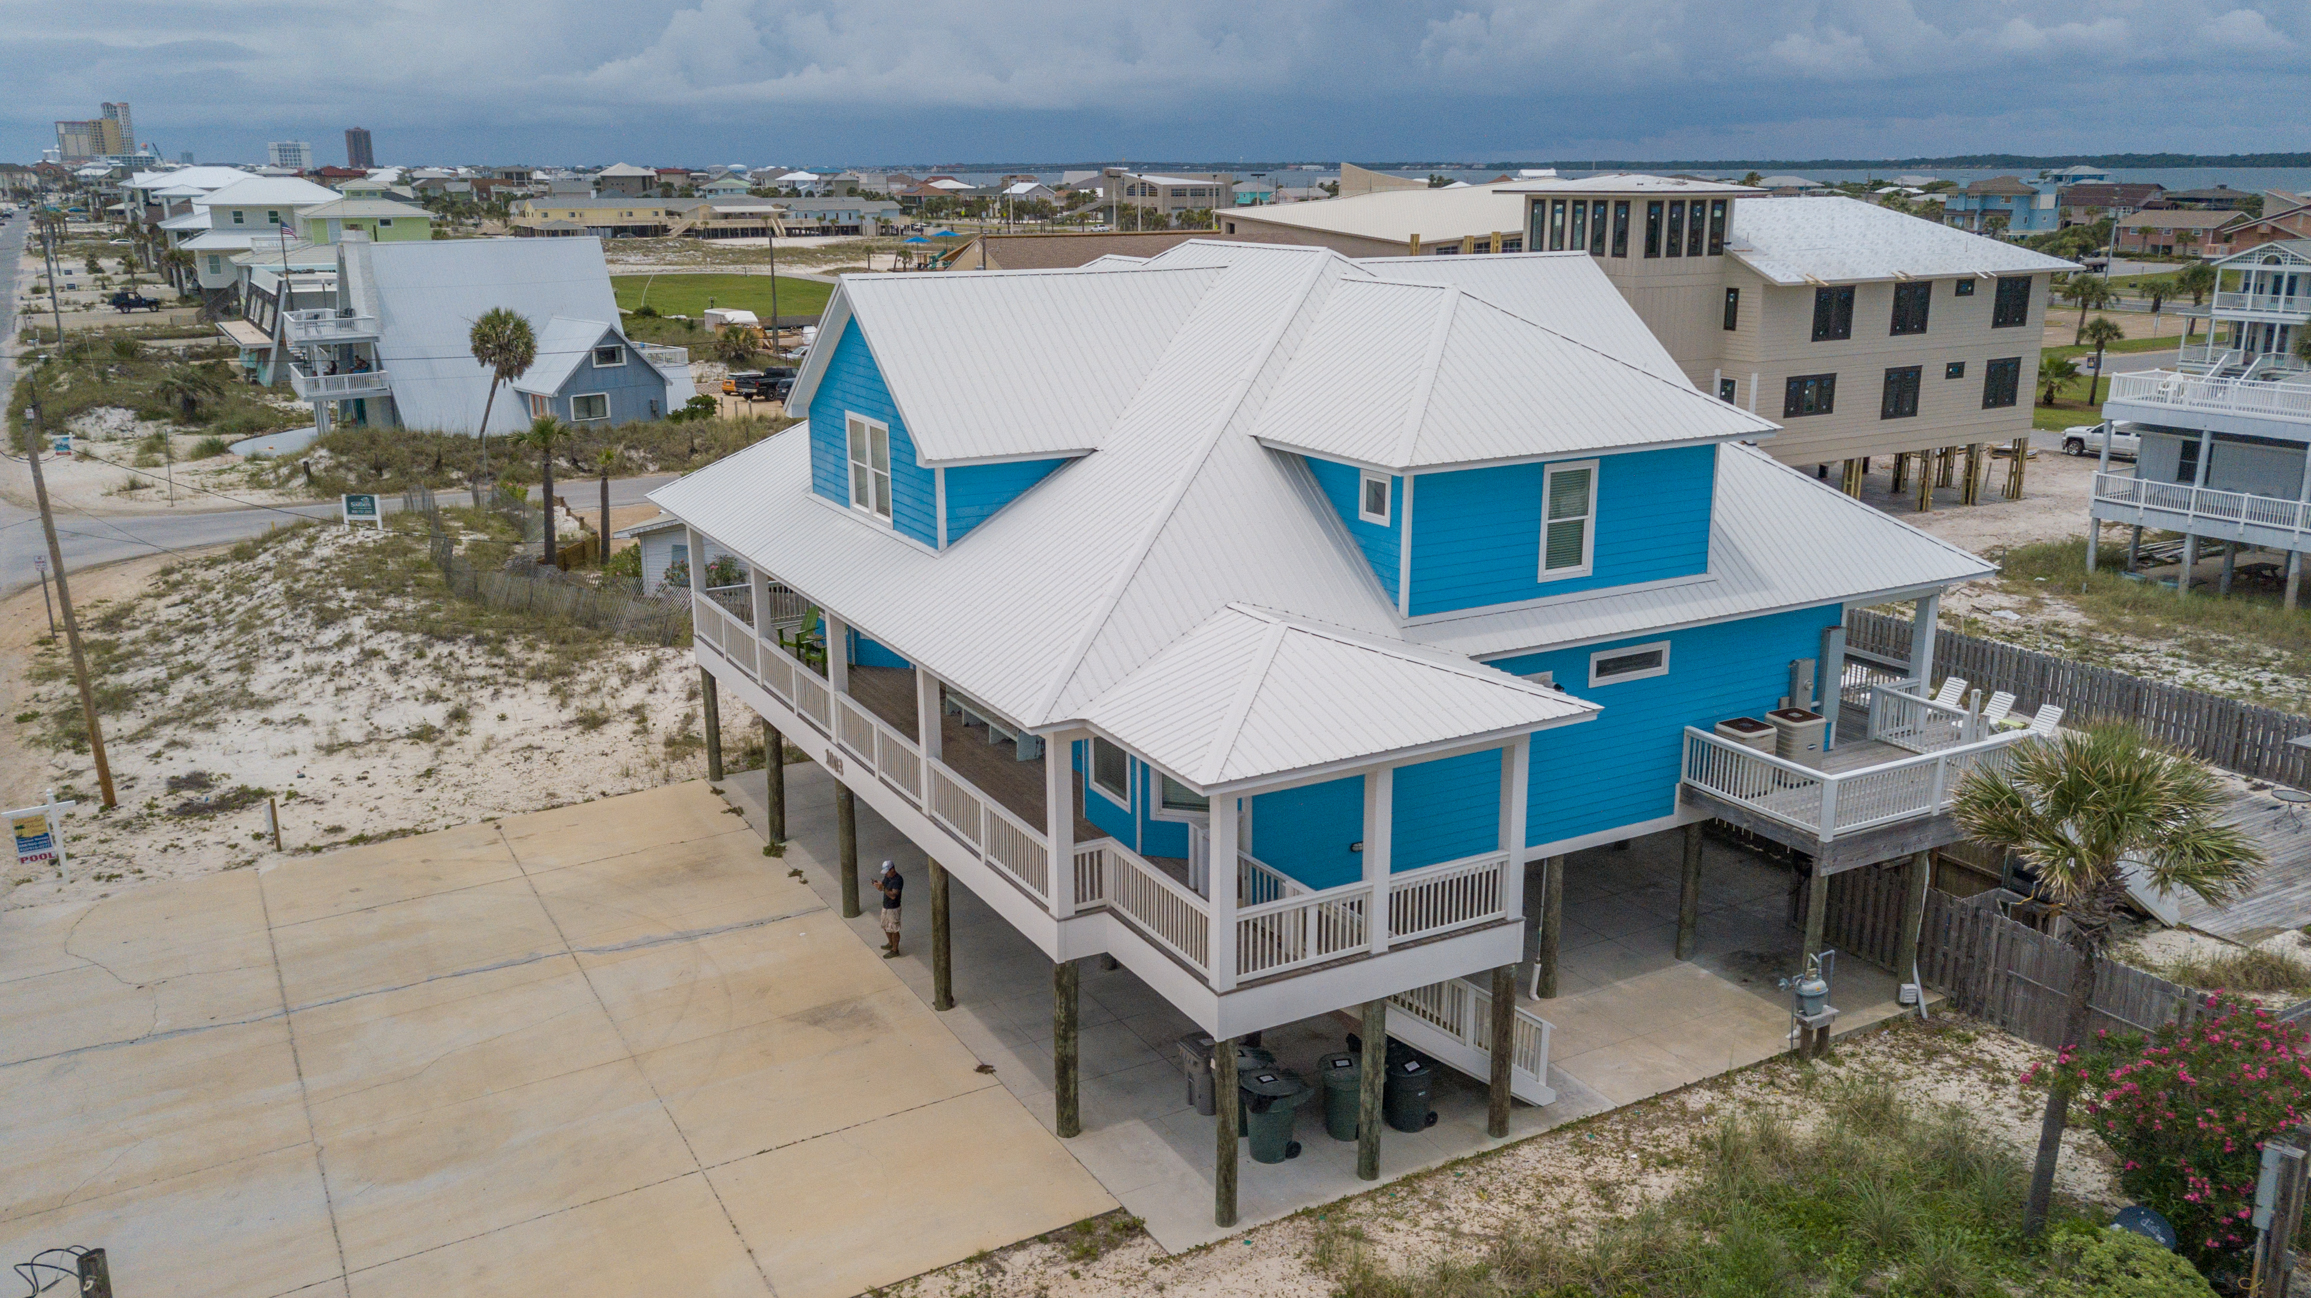 Ariola 1003 - The Starfish House House/Cottage rental in Pensacola Beach House Rentals in Pensacola Beach Florida - #65